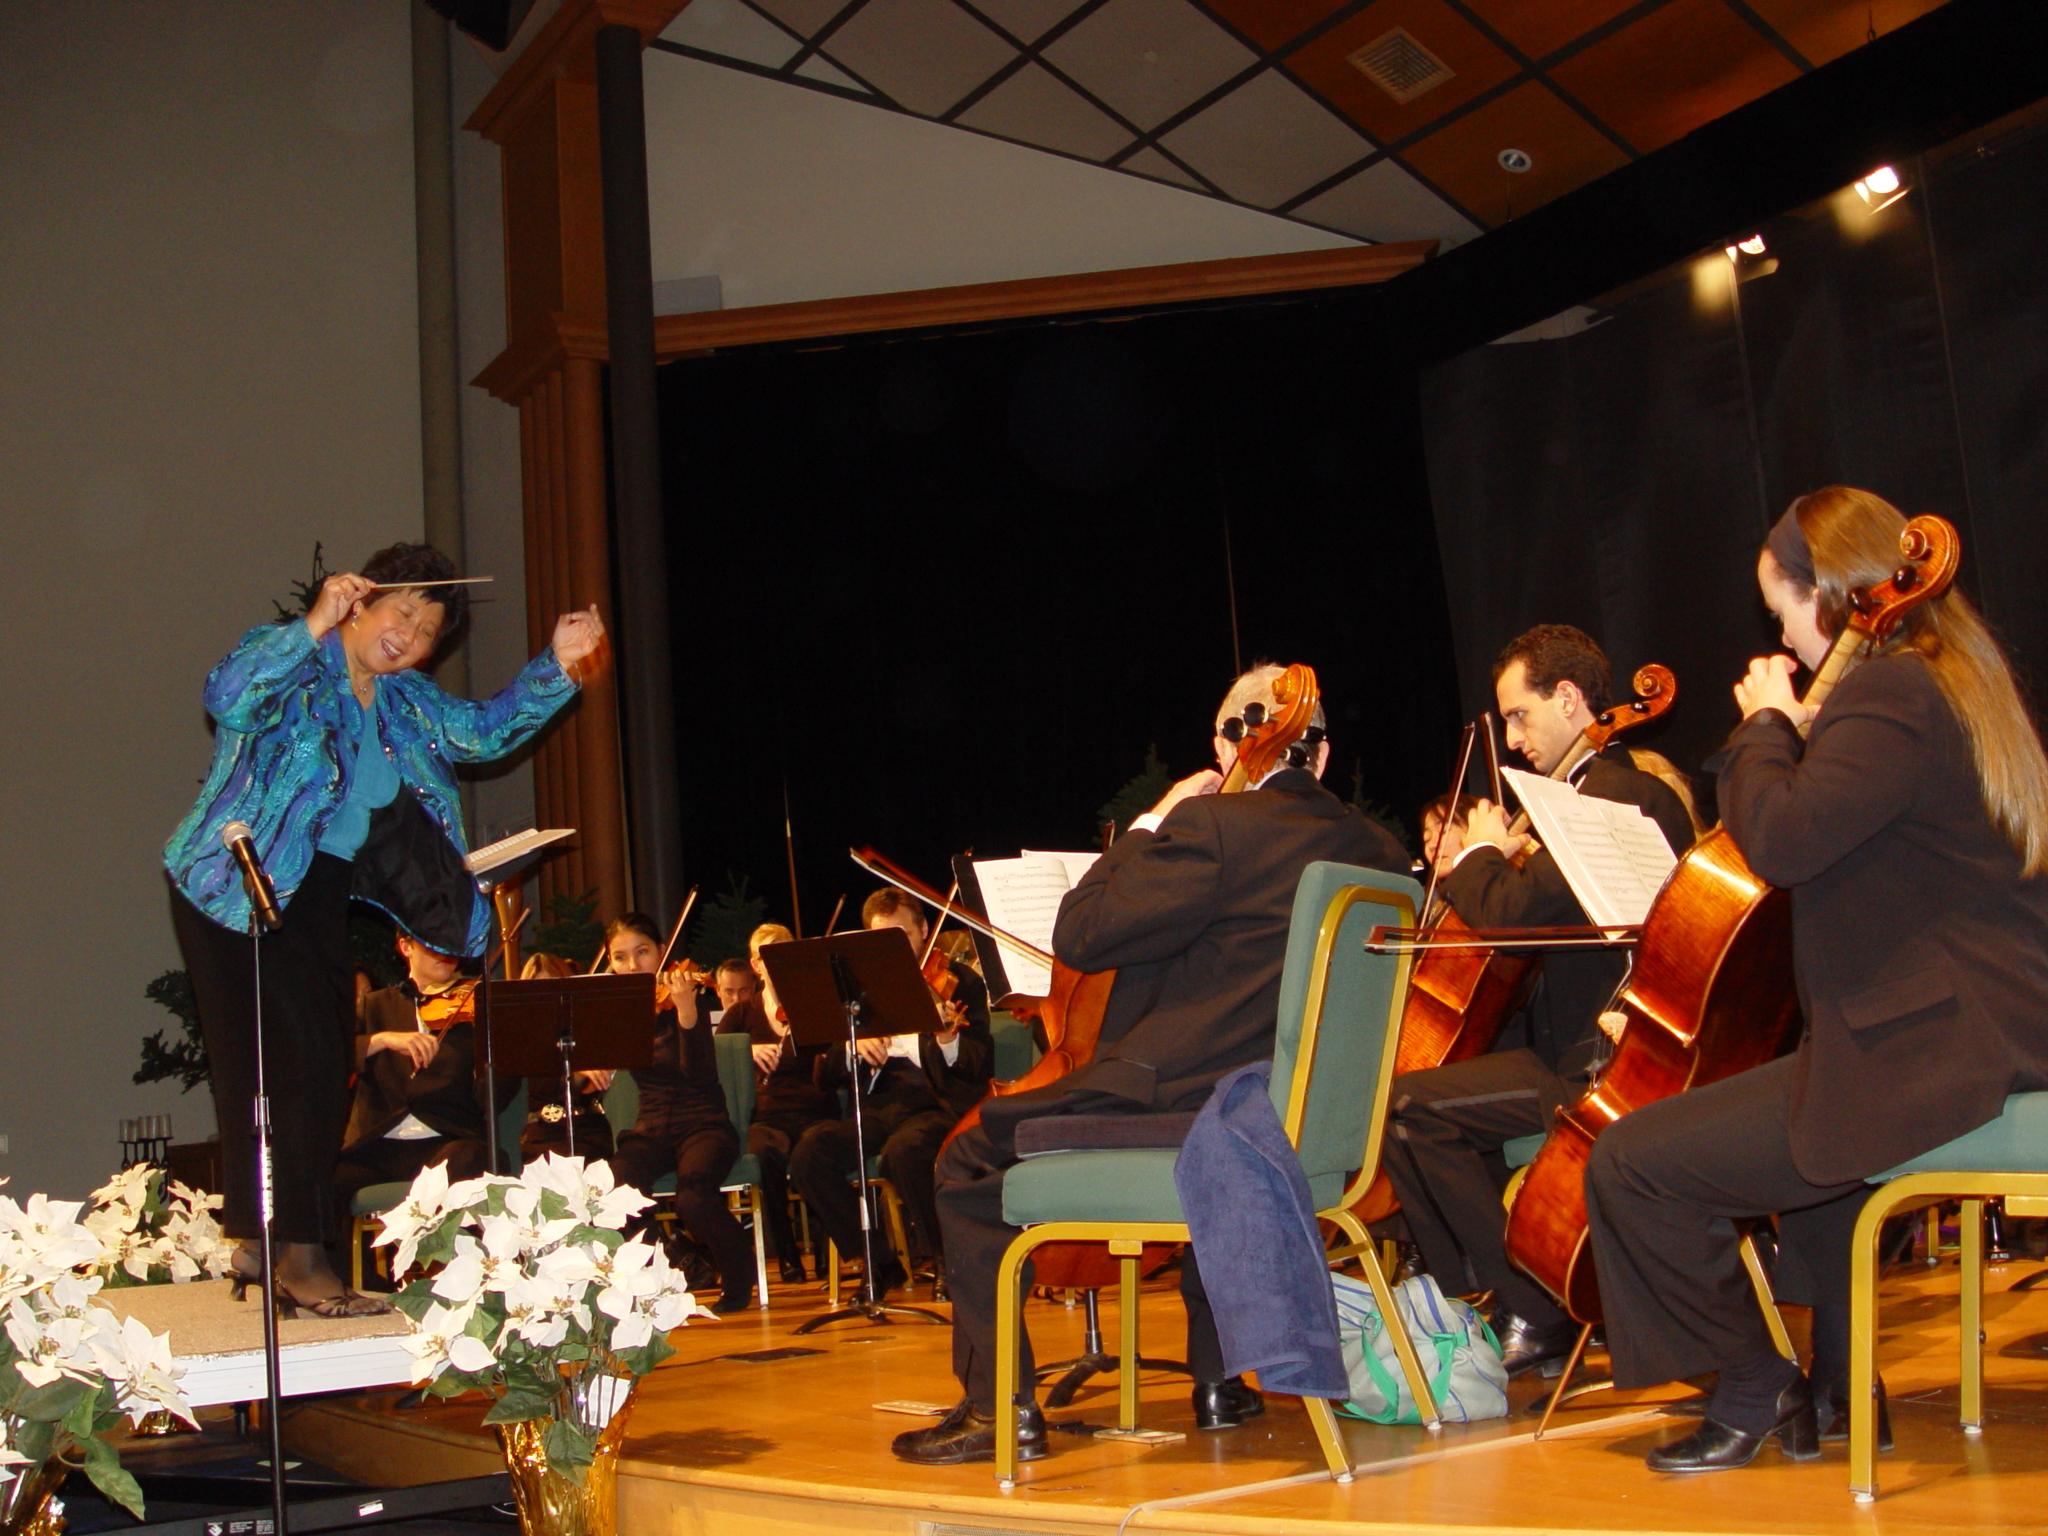 Maestra and orchestrahaving fun at performing